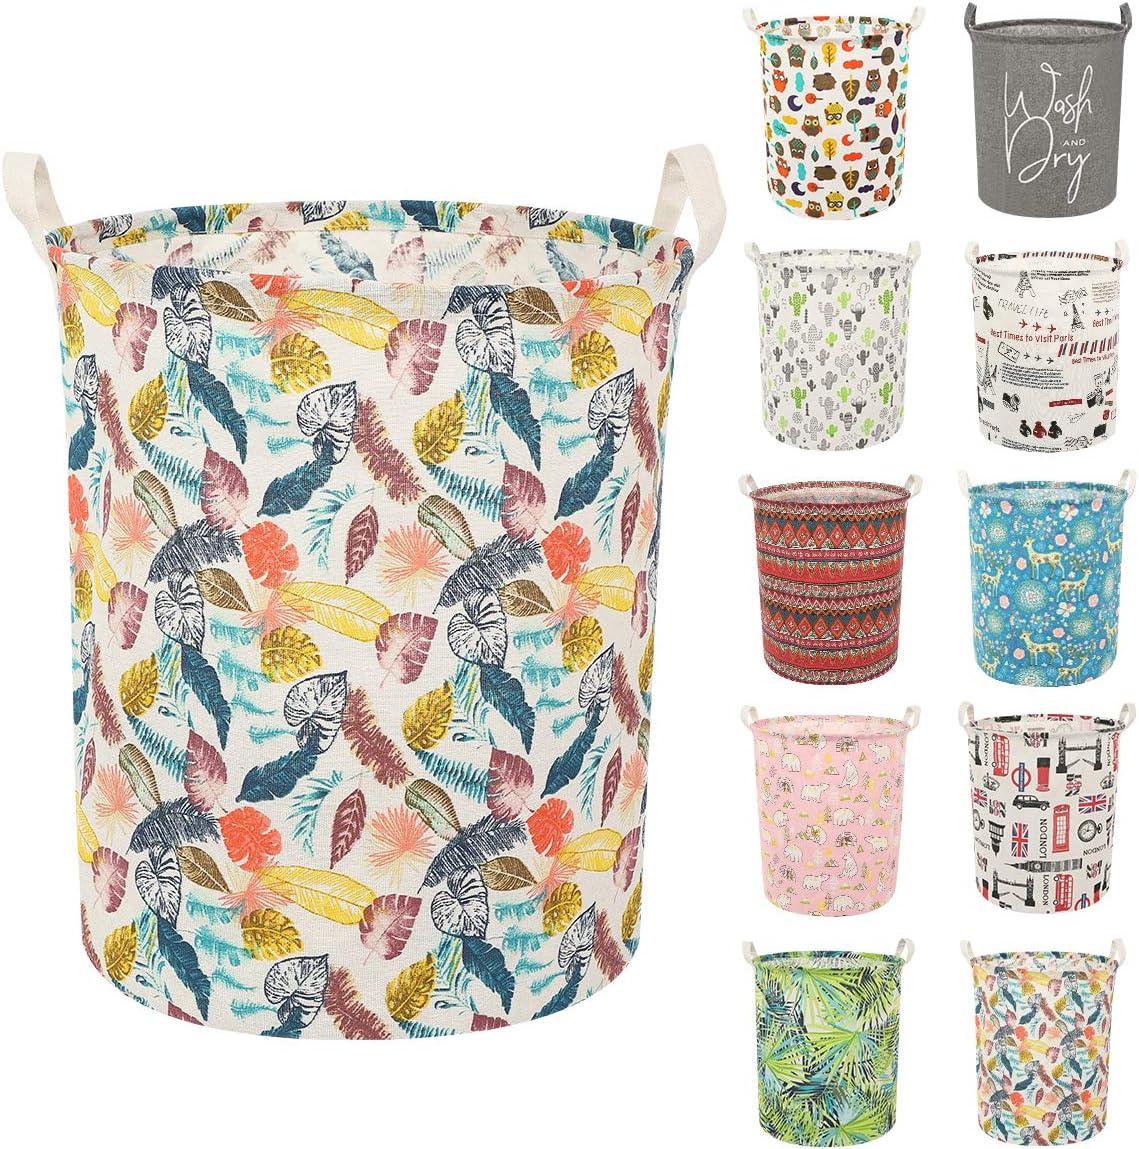 Clothes Laundry Hamper Storage Bin Large Collapsible Storage Basket Kids Canvas Laundry Basket for Home Bedroom Nursery Room (Y-Colorful Leaves, L)